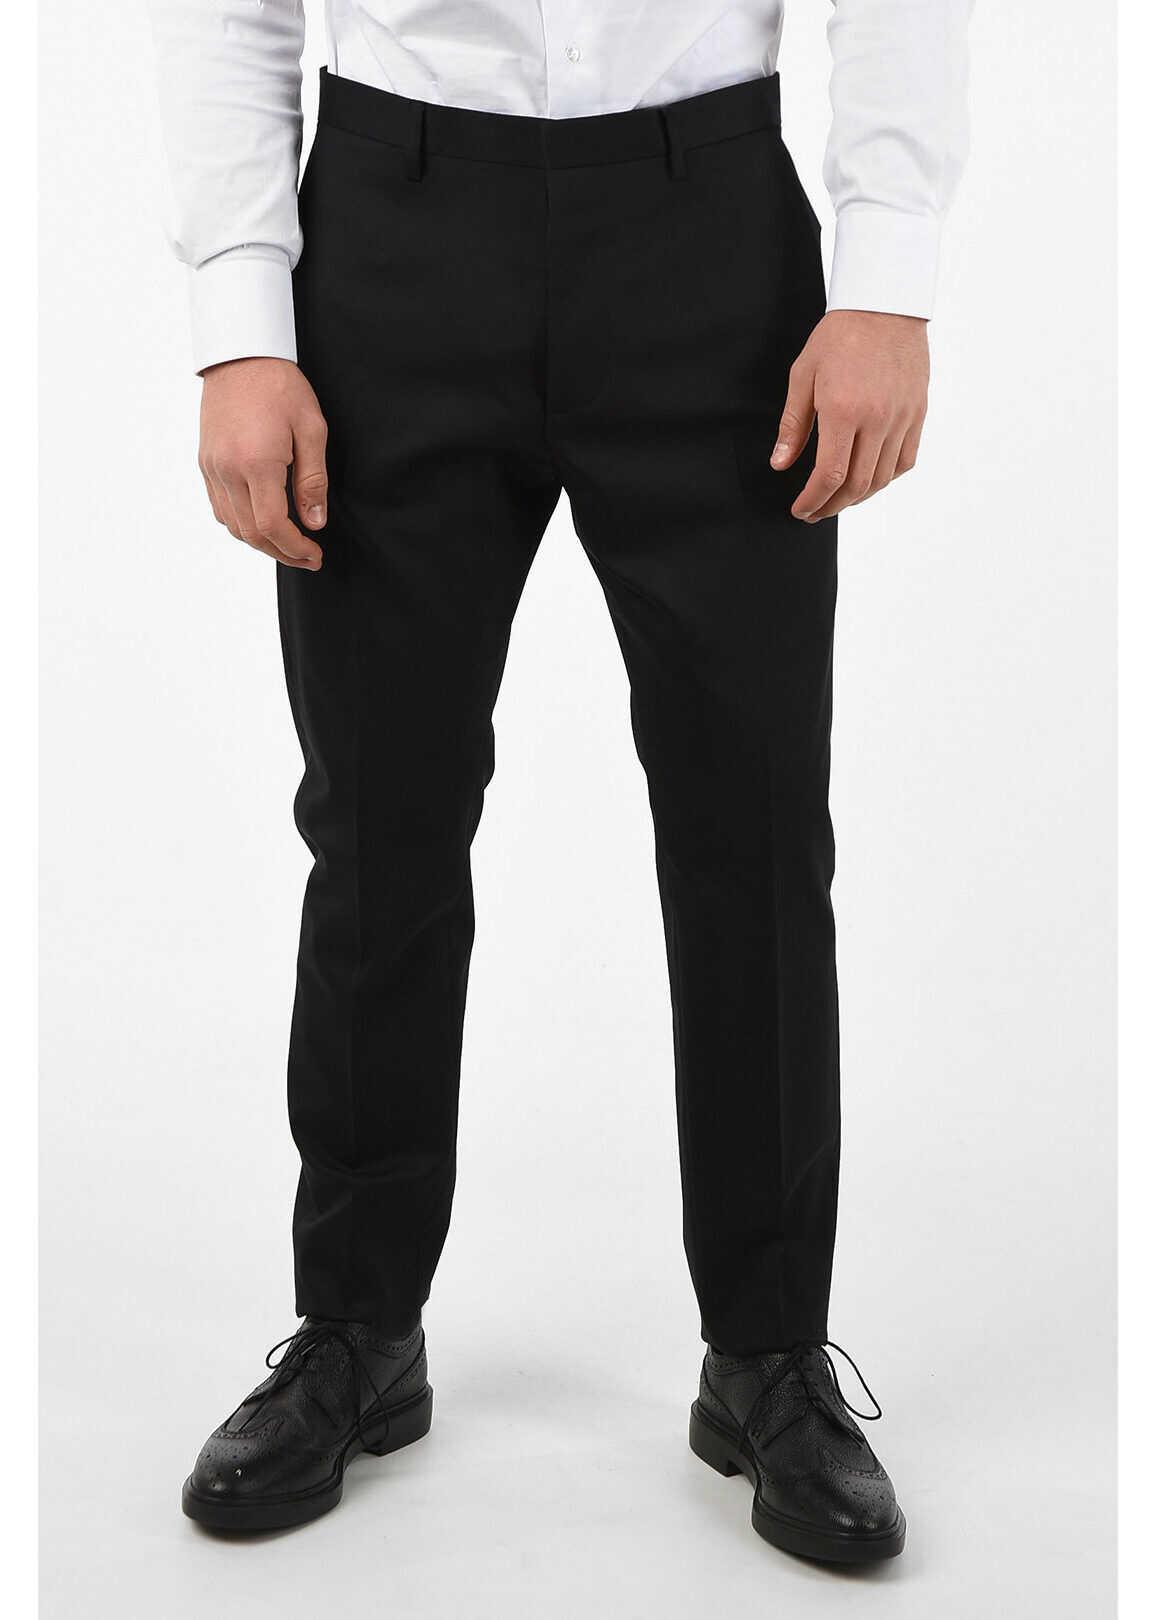 DSQUARED2 Virgin Wool Single Pleat HOCKNEY FIT Pants BLACK imagine